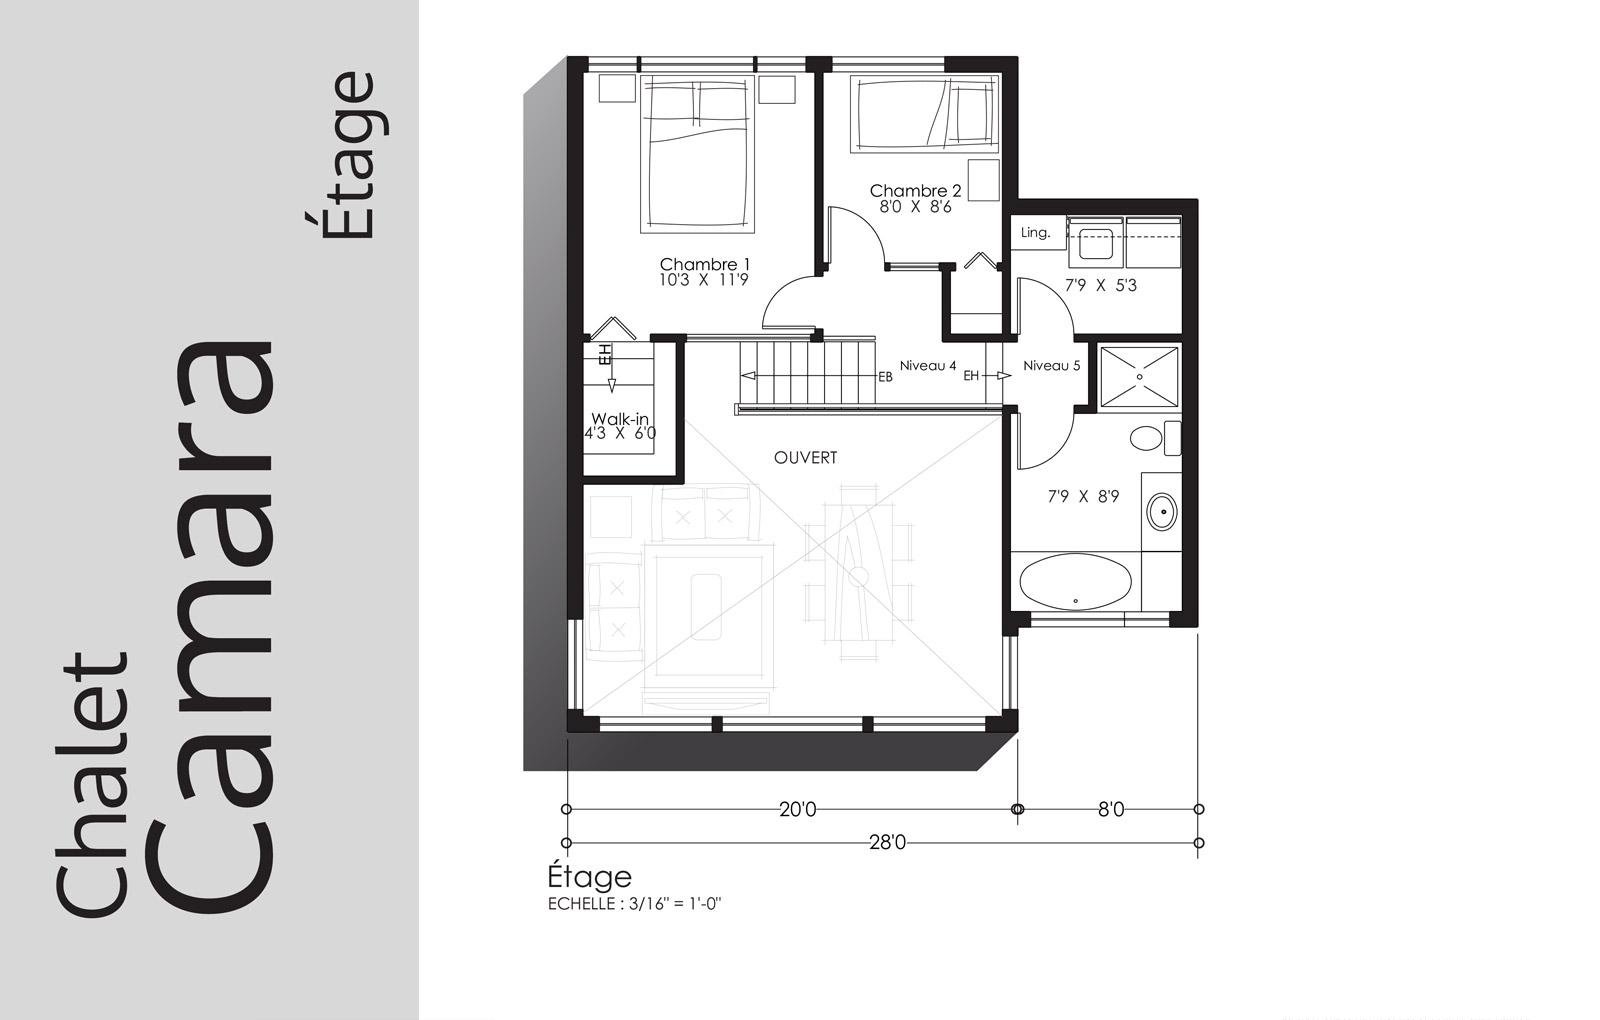 plan Camara - Étage - Domaine Escapad